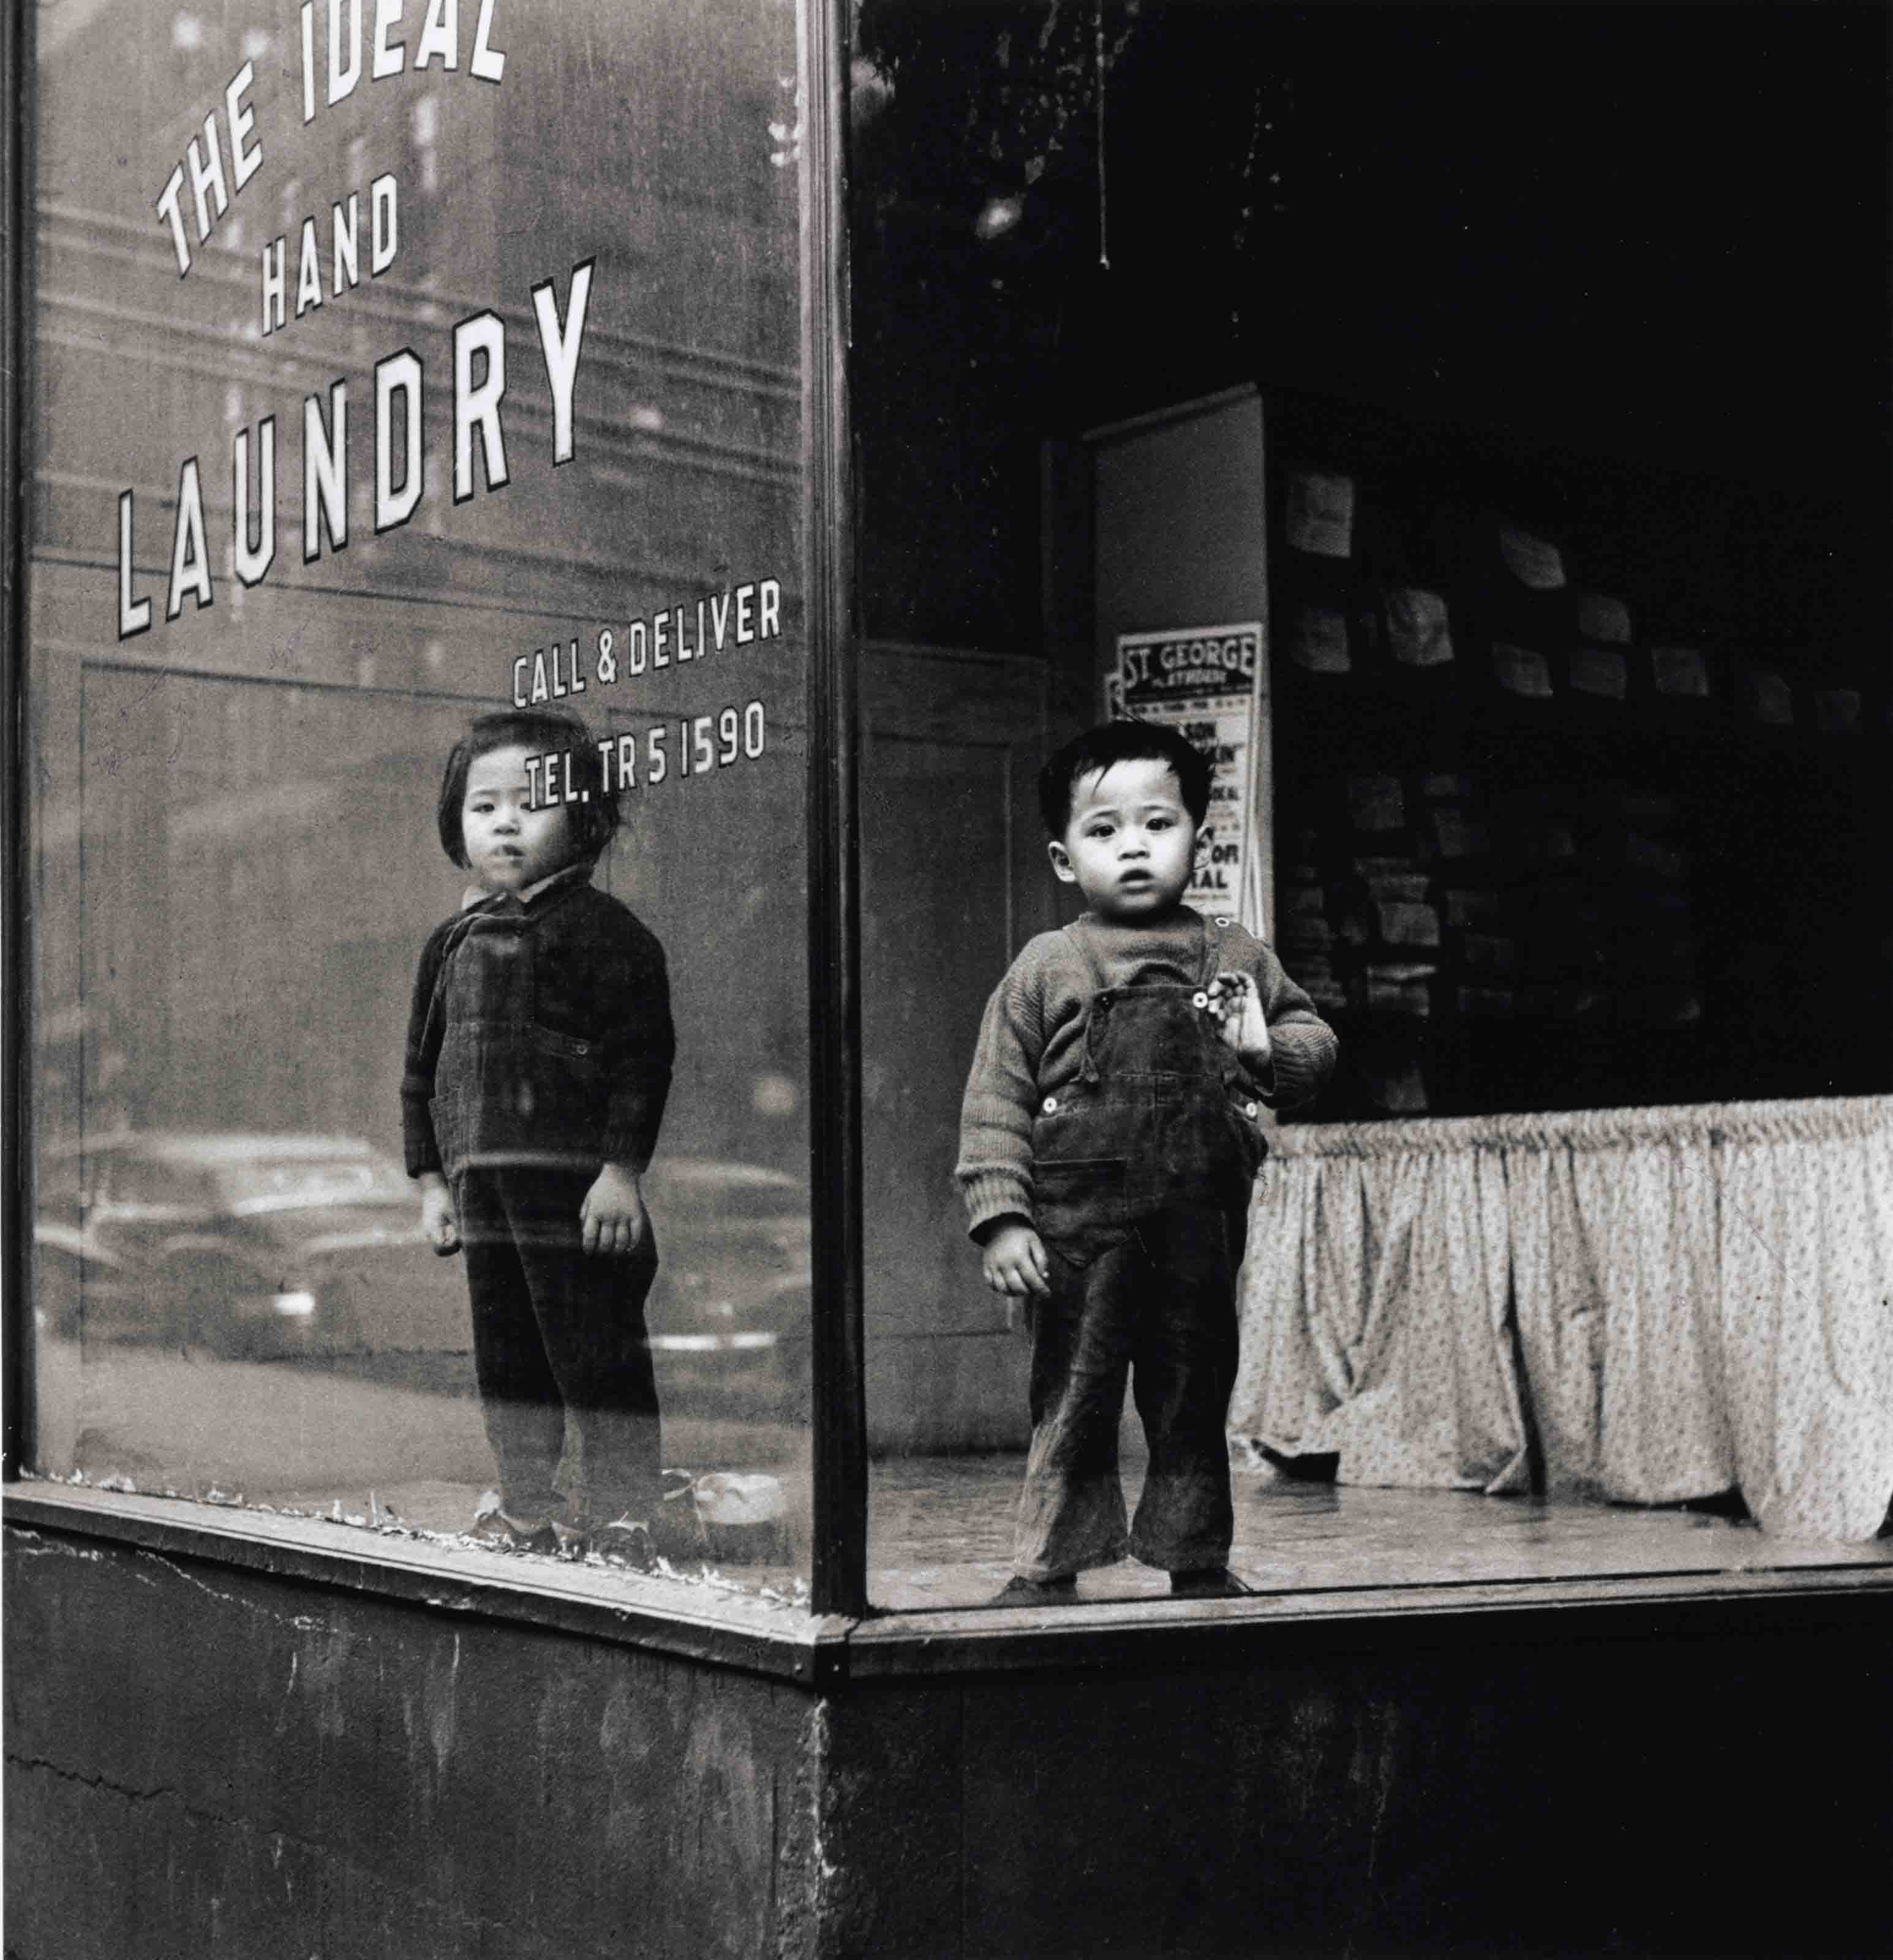 Ideal Laundry, New York, 1950